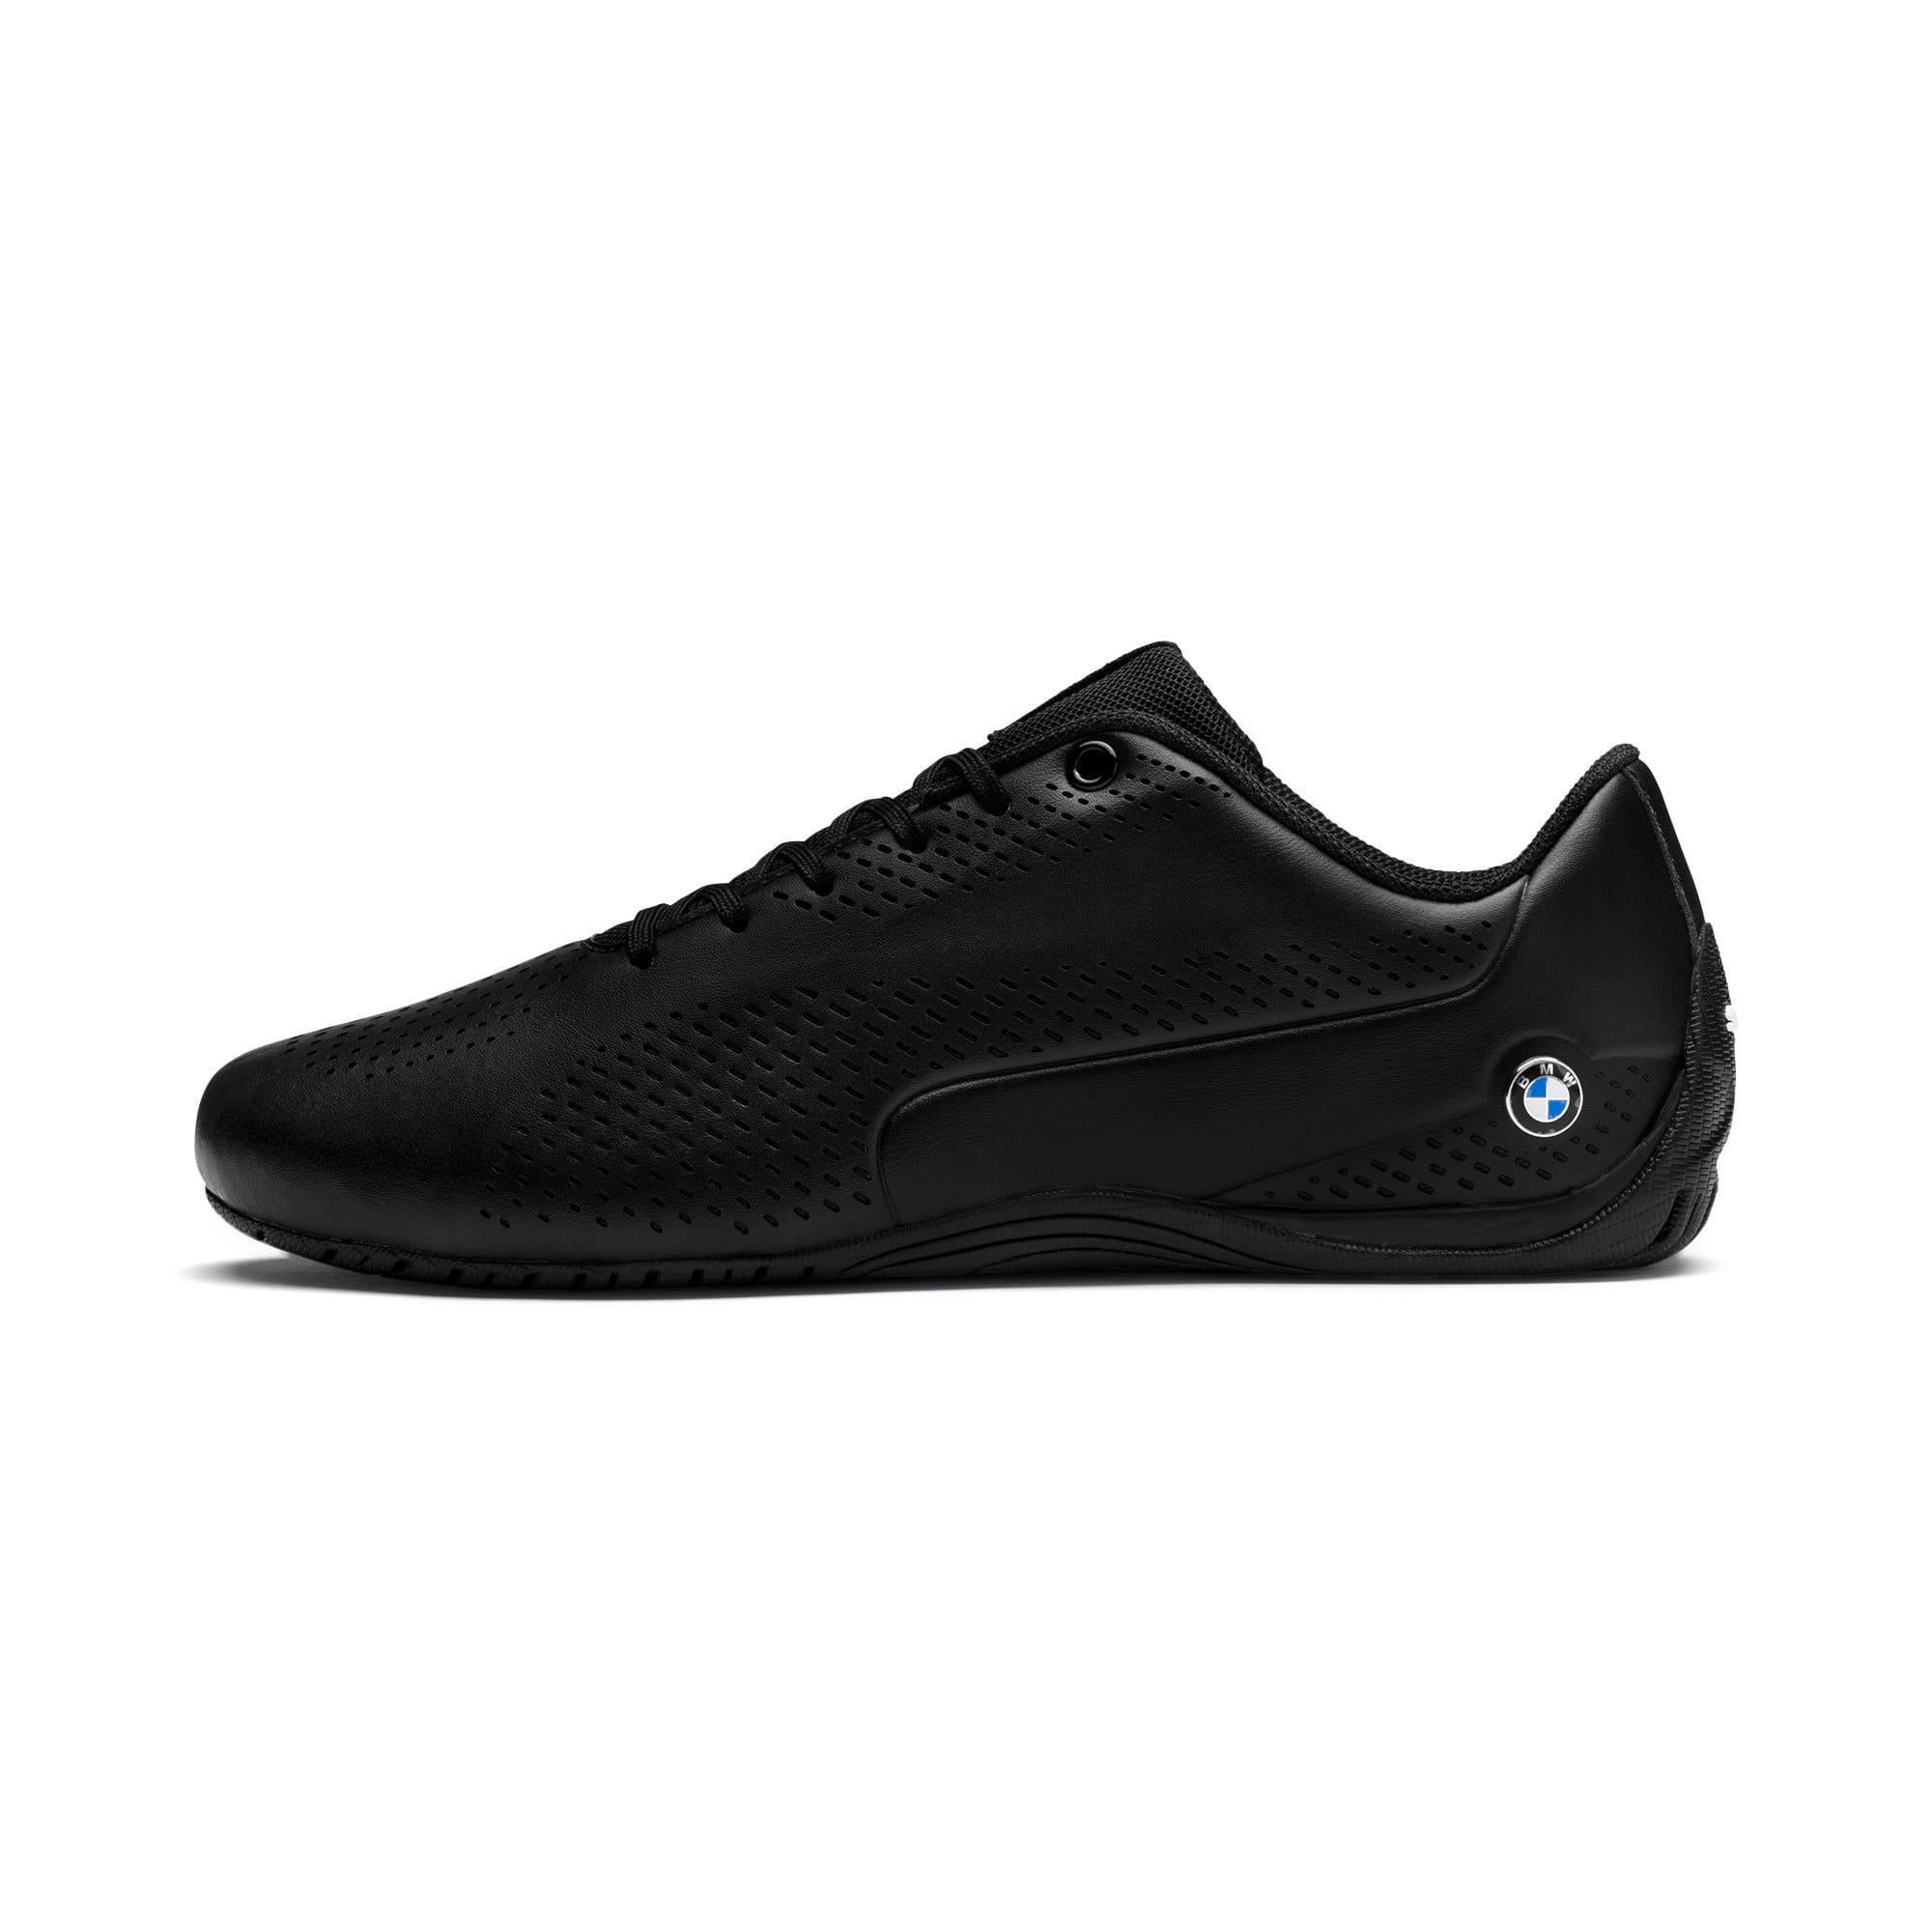 Thumbnail 1 of BMW M Motorsport Drift Cat 5 Ultra II Men's Shoes, Puma Black-Puma Black, medium